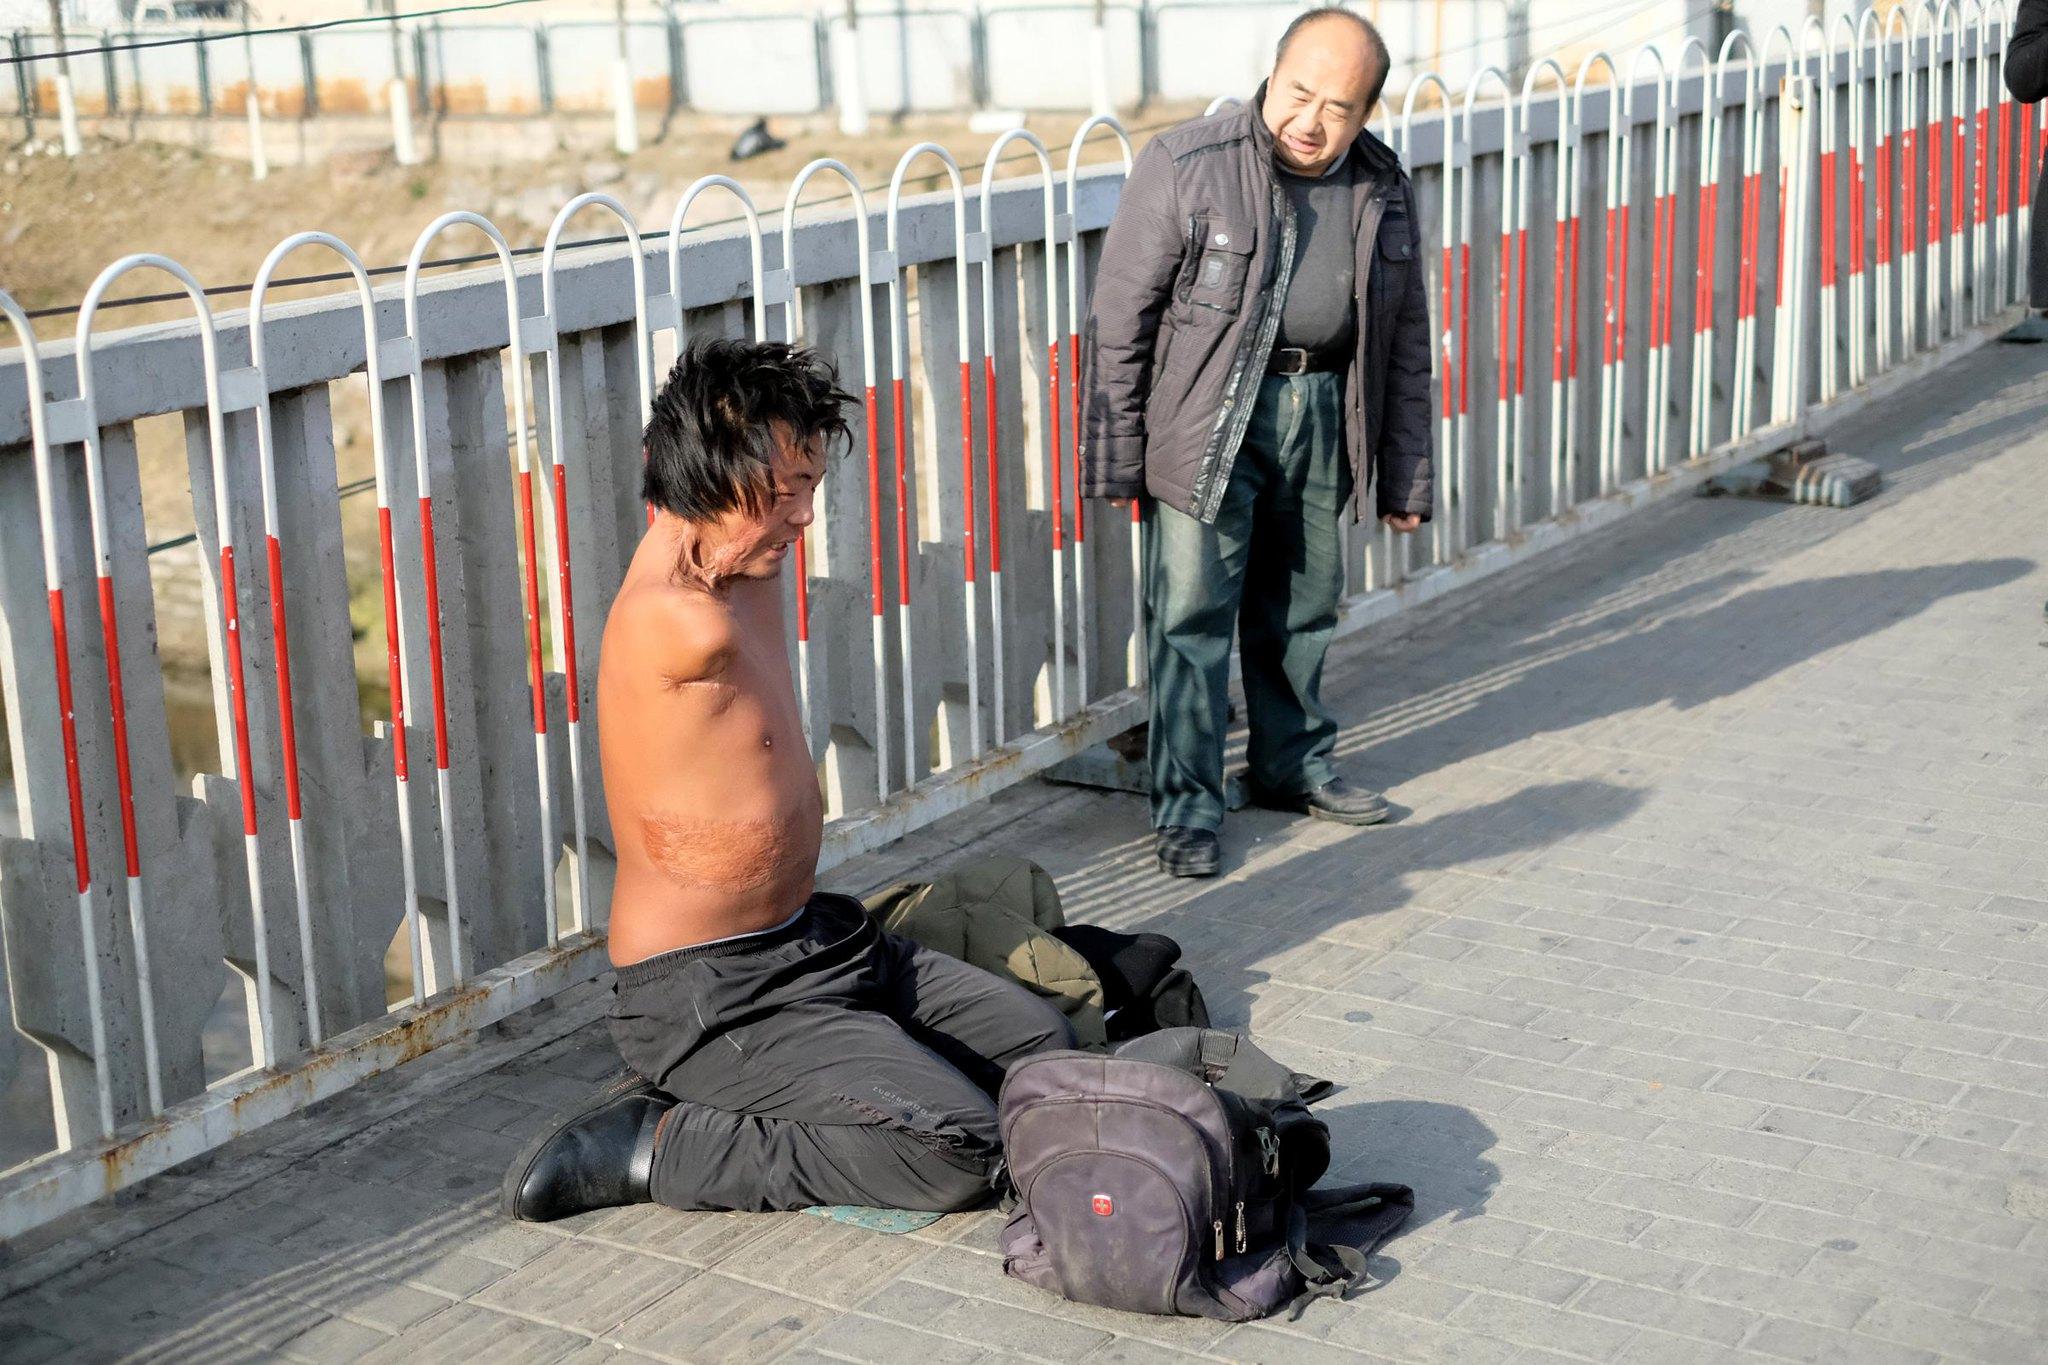 Bettler ohne Arme